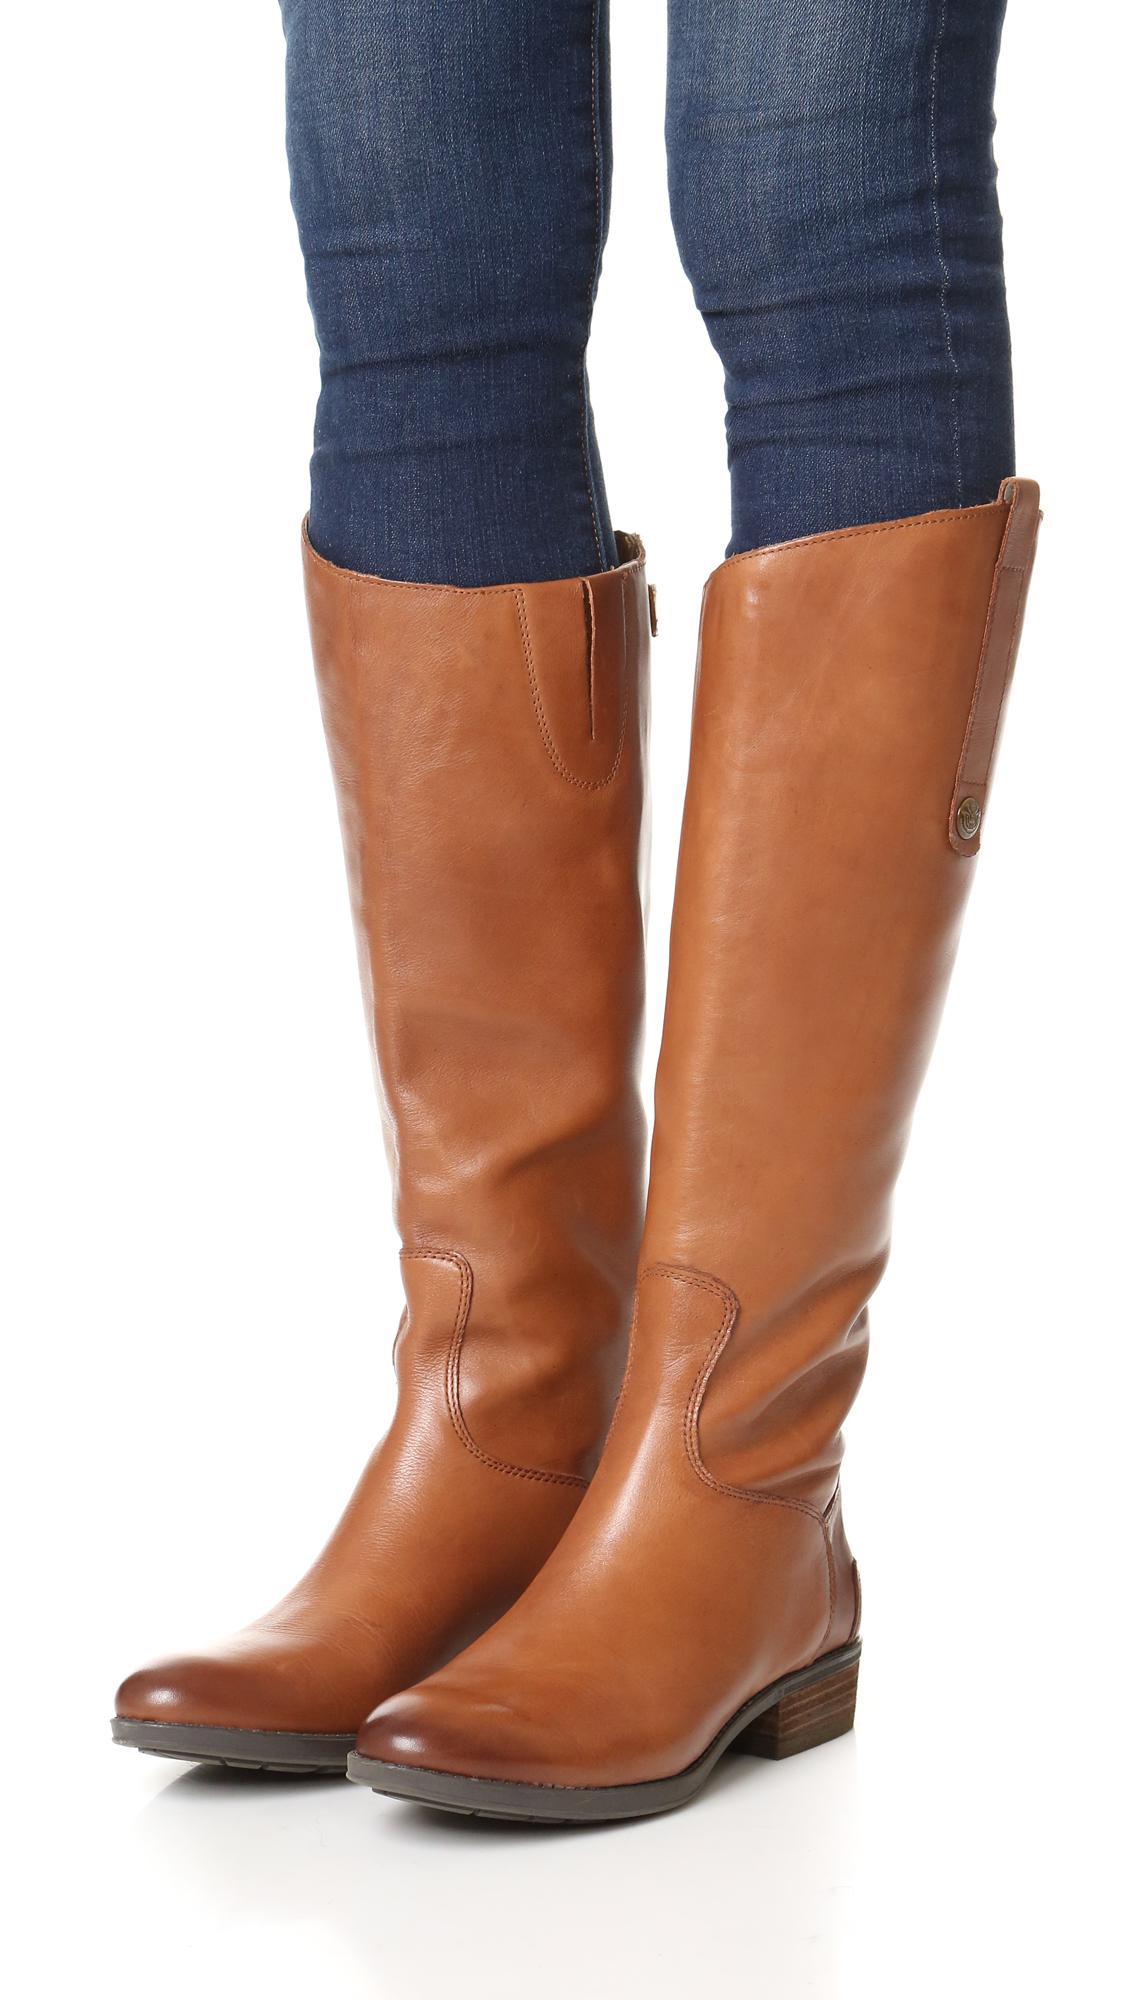 03f42f95e68b Sam Edelman - Brown Penny Riding Boots - Lyst. View fullscreen